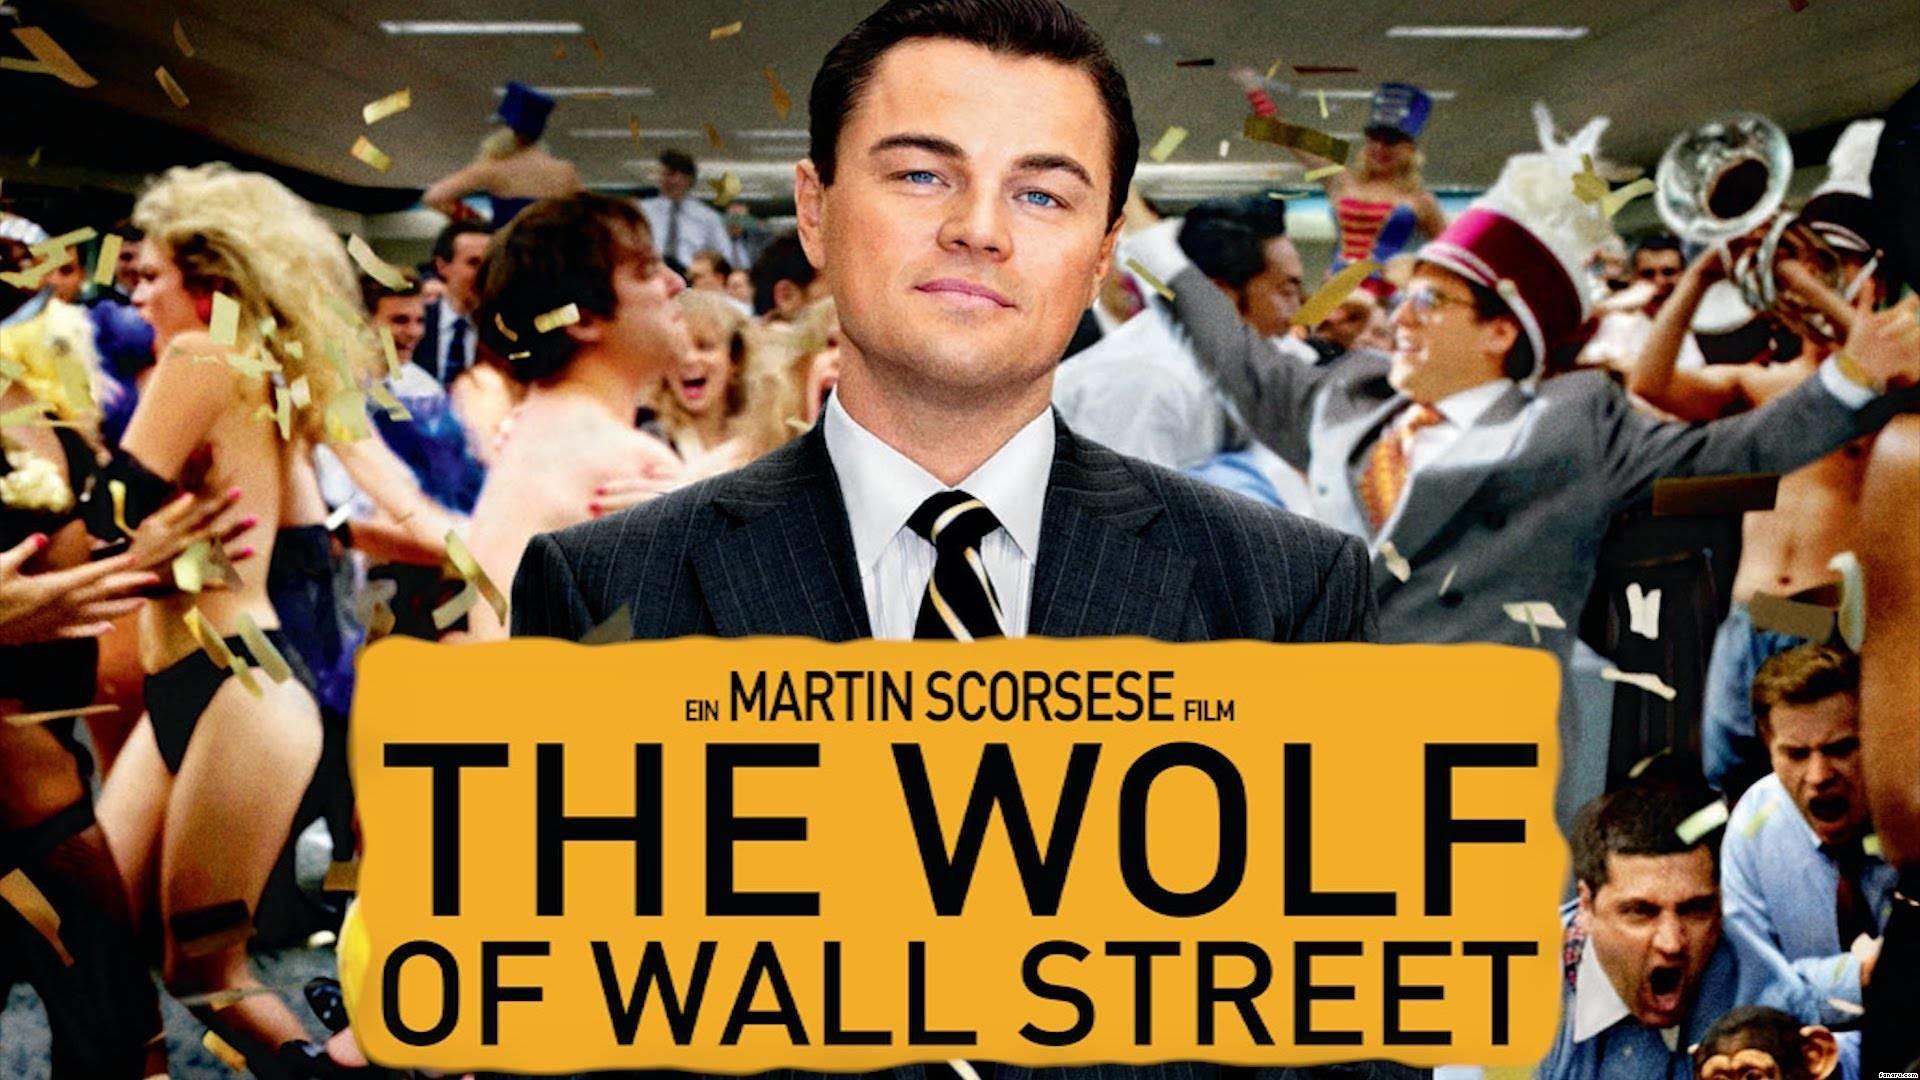 The Wolf Of Wall Street Wallpaper #13413 Wallpaper | Wallpaper hd